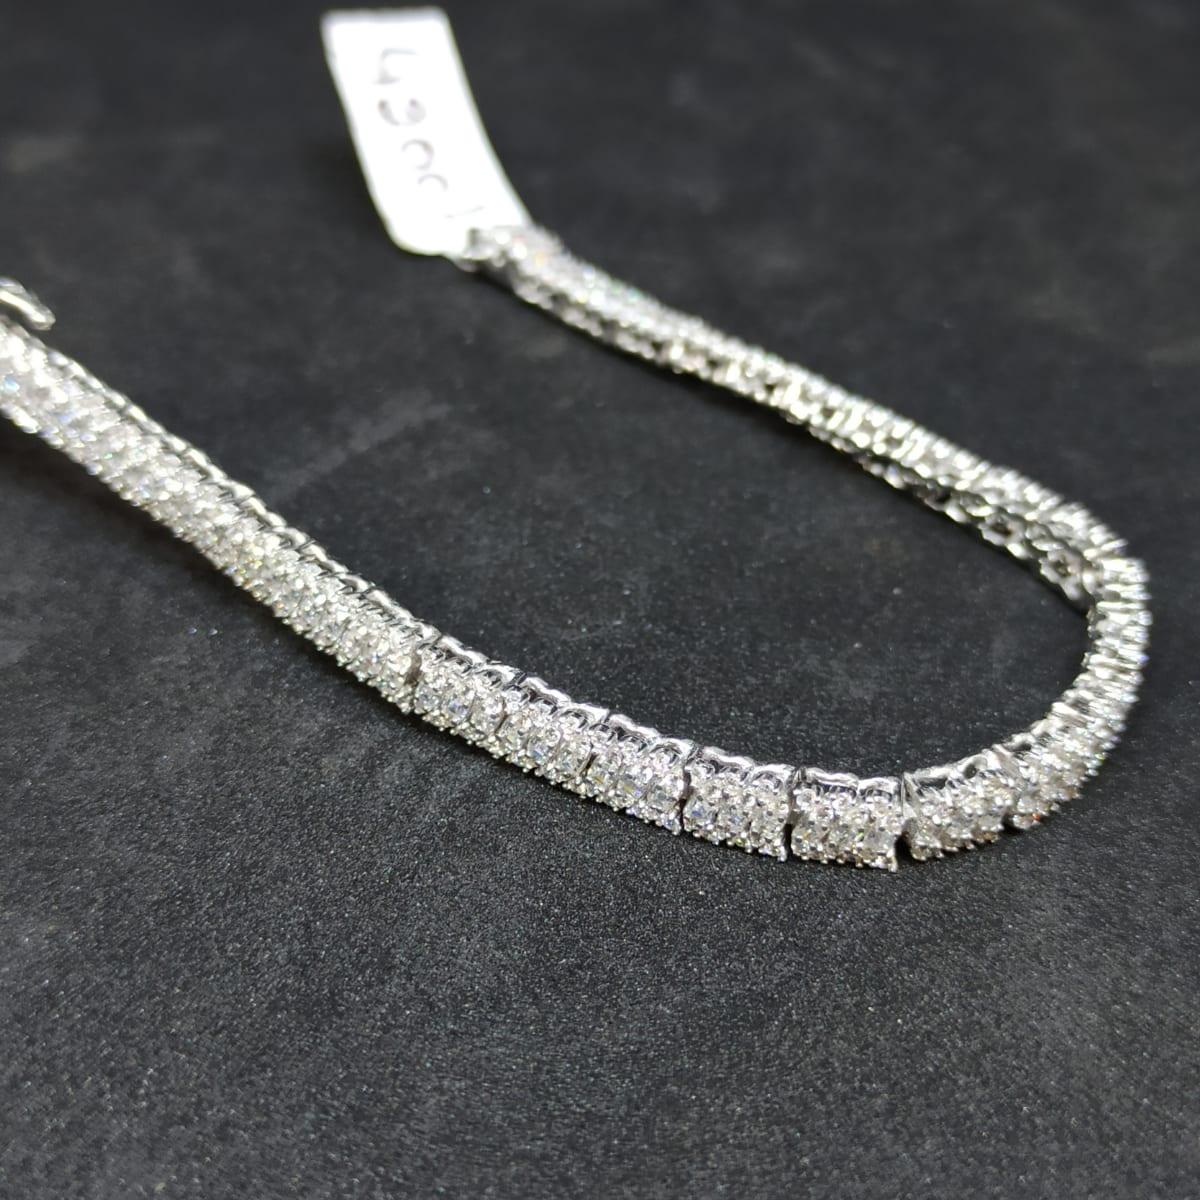 Brusiers Bracelets